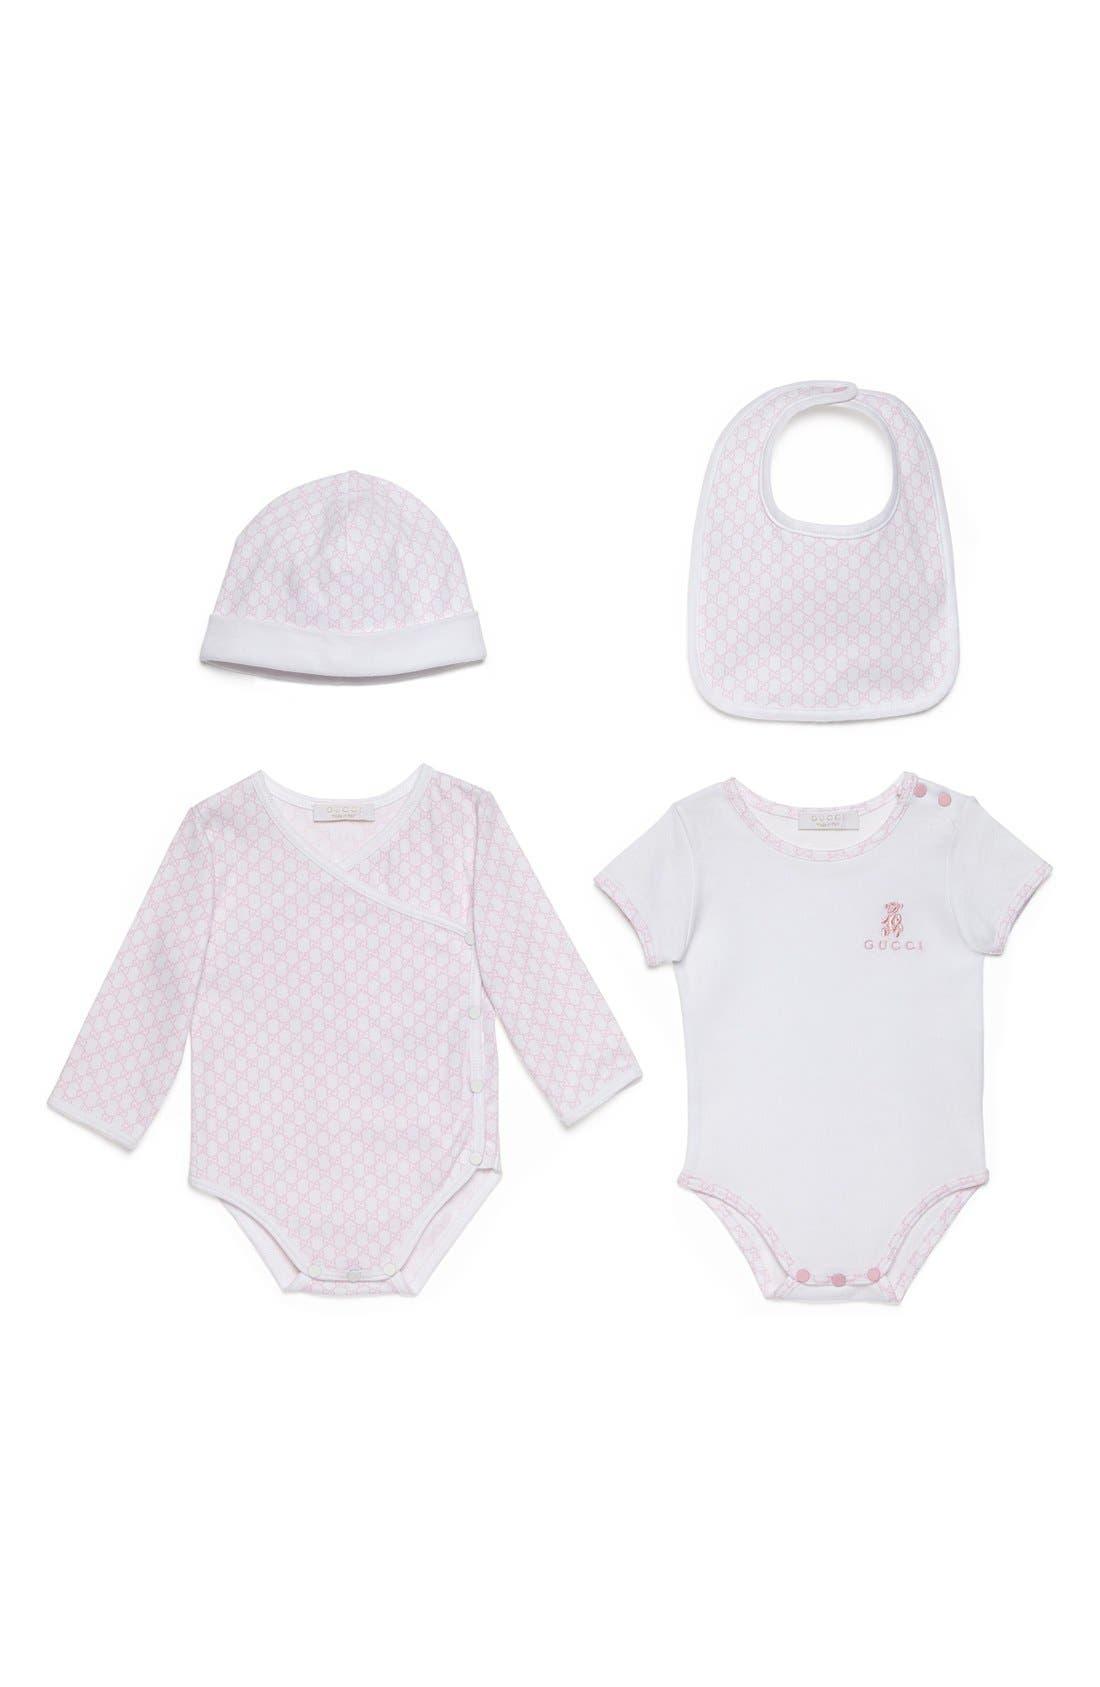 Short Sleeve Bodysuit, Long Sleeve Bodysuit, Hat & Bib Set,                         Main,                         color, Pink